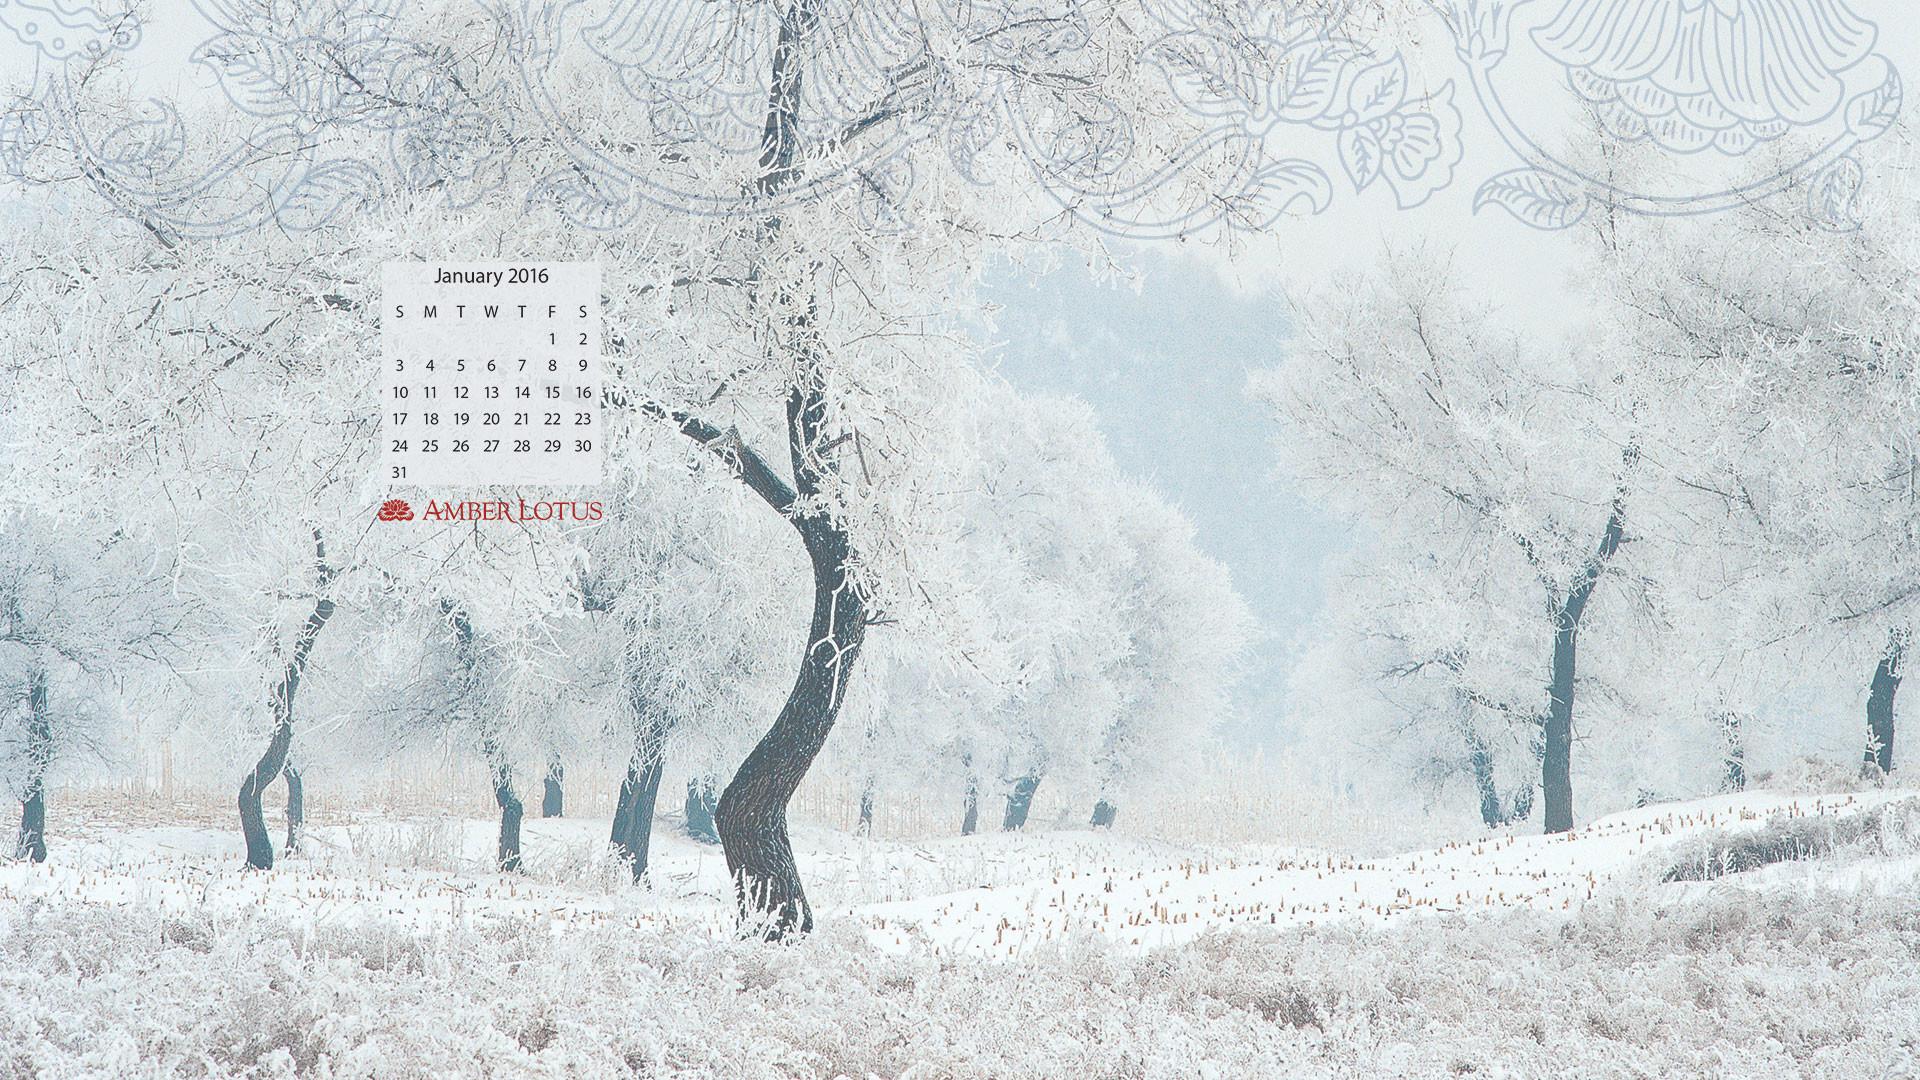 February 2018 Wallpaper Calendar 63 images 1920x1080